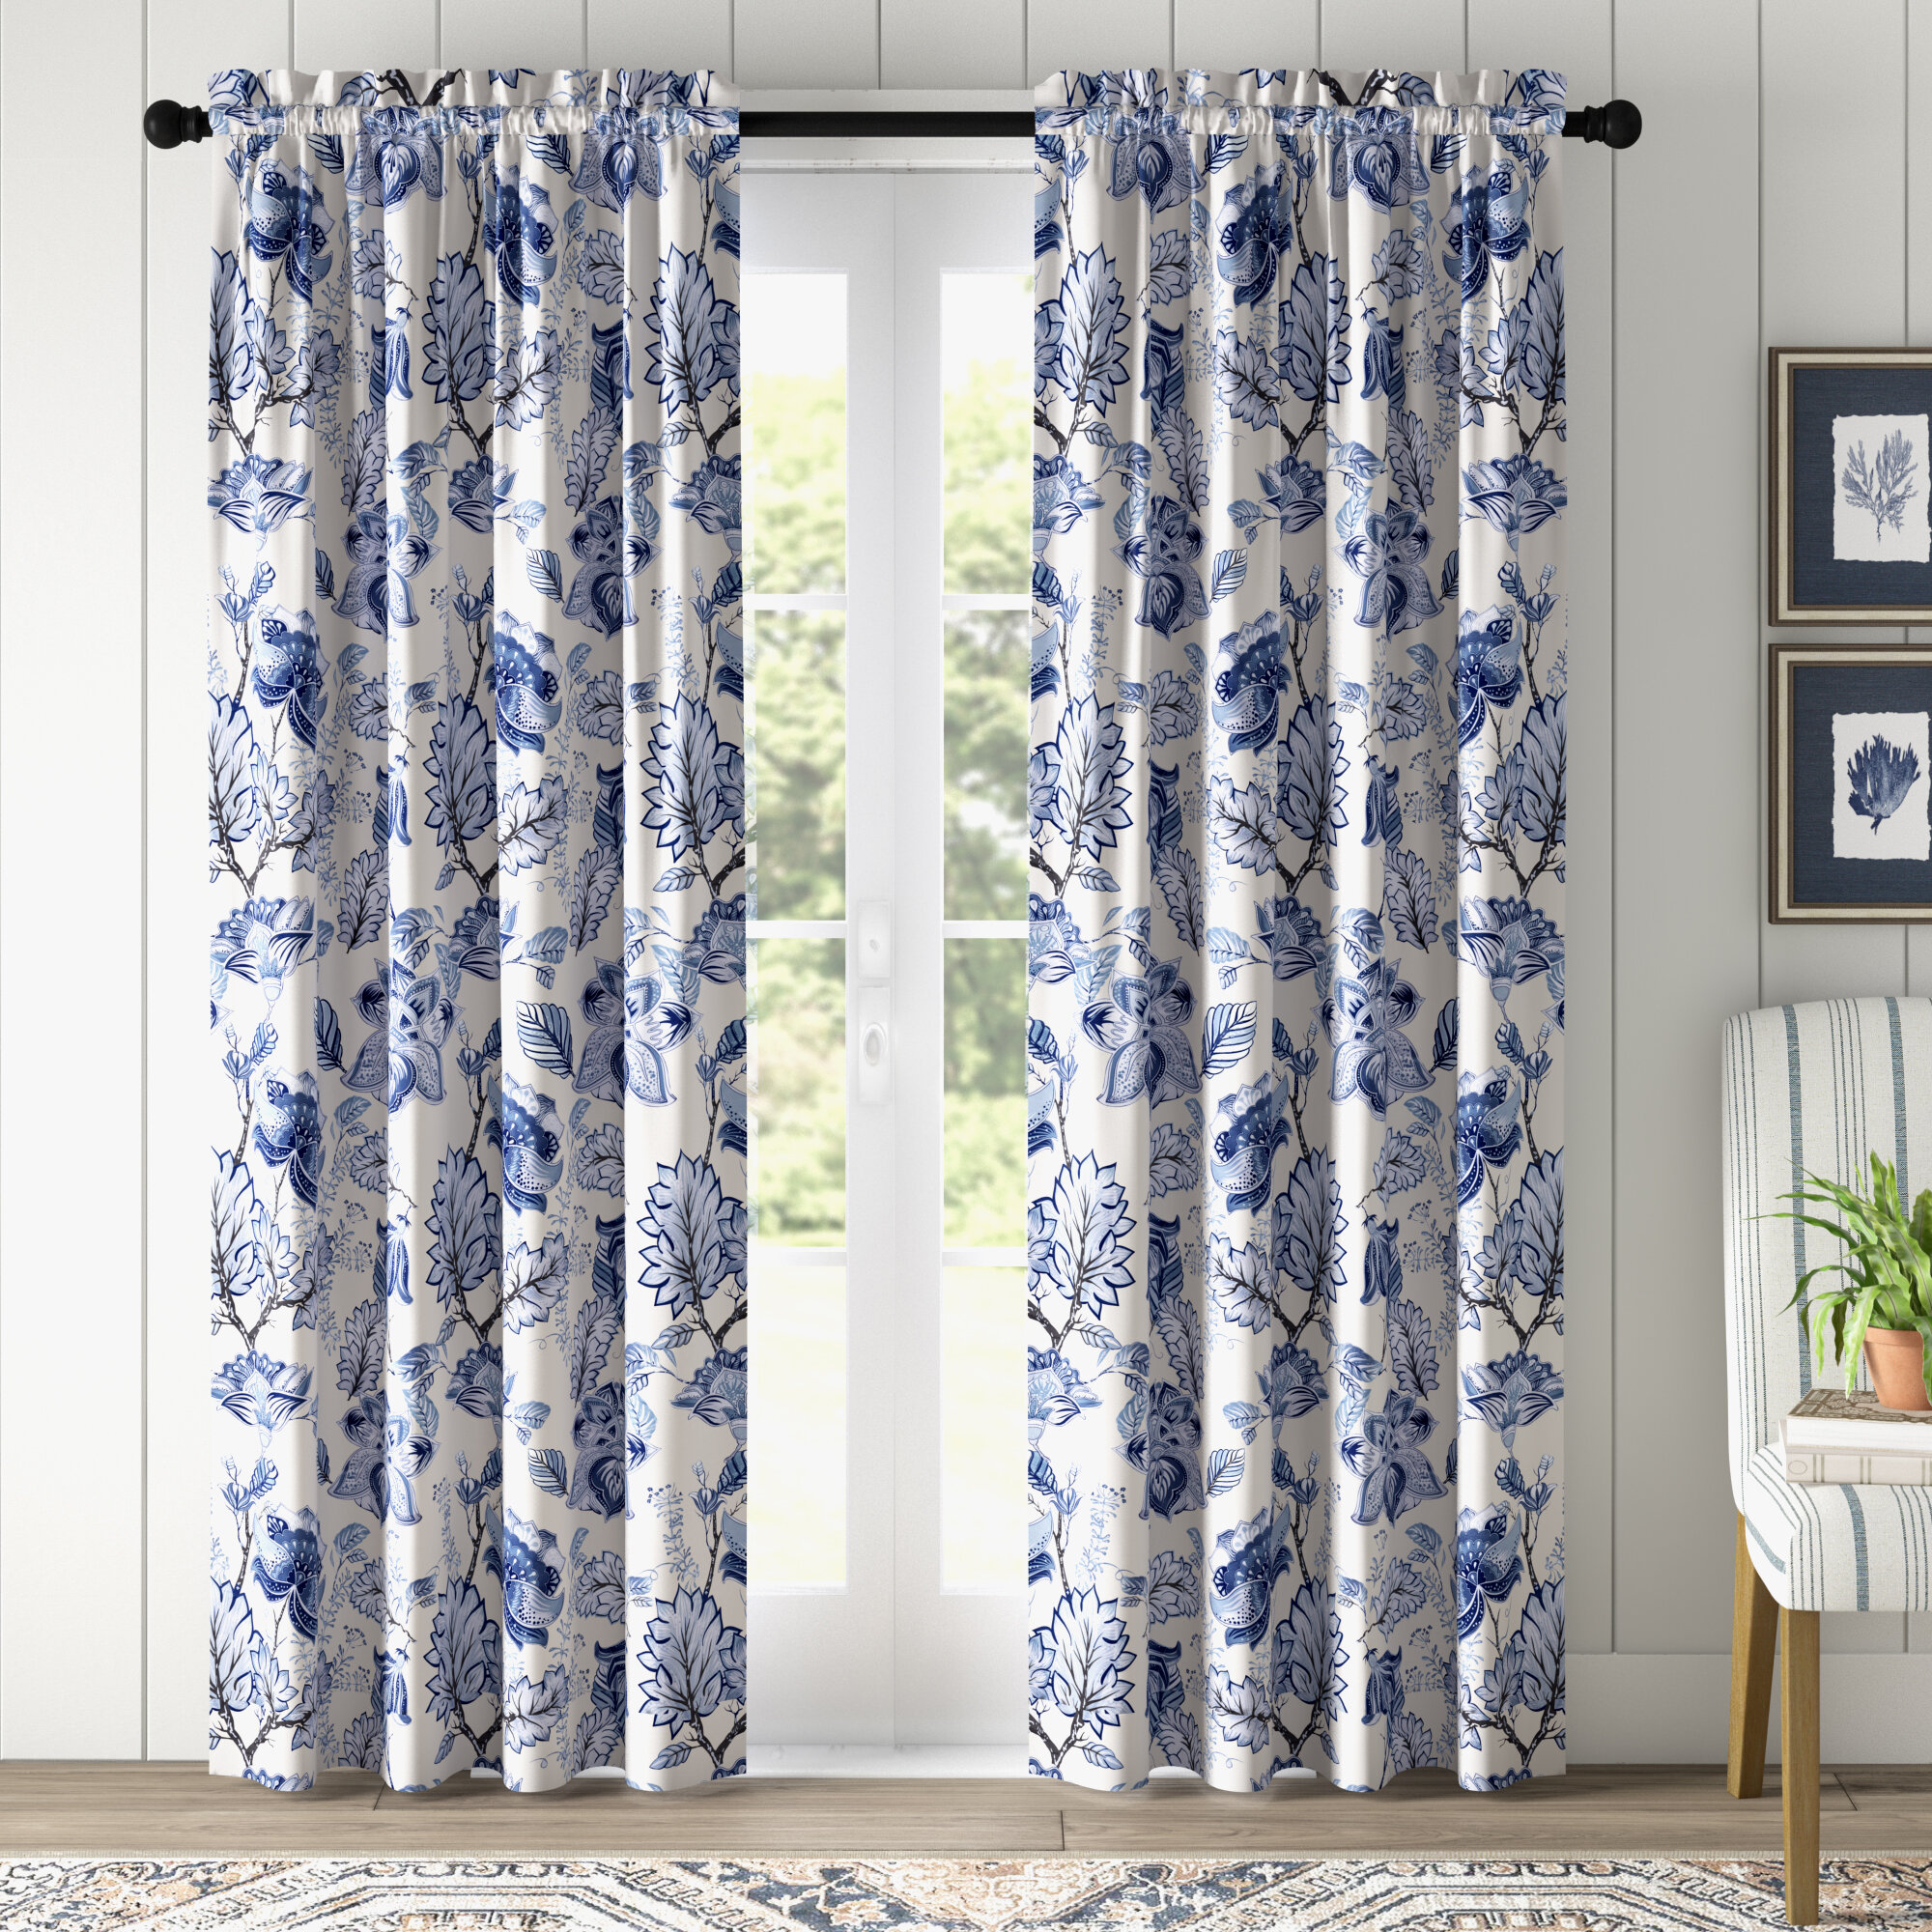 Bargas Floral Semi Sheer Thermal Rod Pocket Curtain Panels Reviews Birch Lane